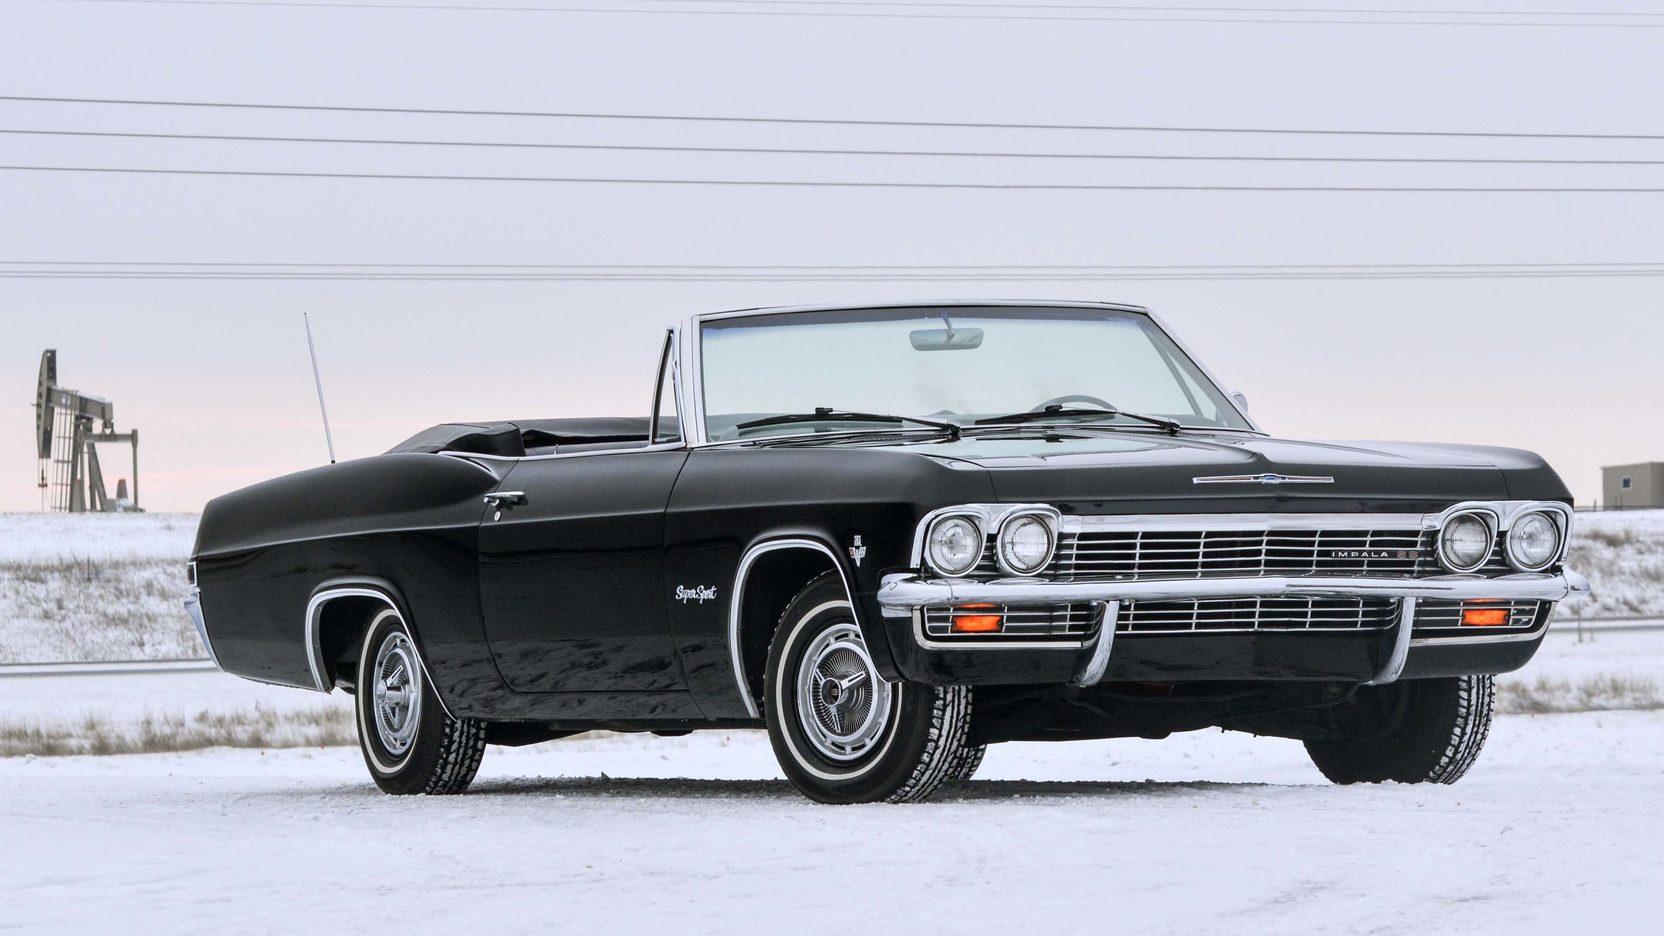 1965 Chevrolet Impala SS black snow hill front 3/4